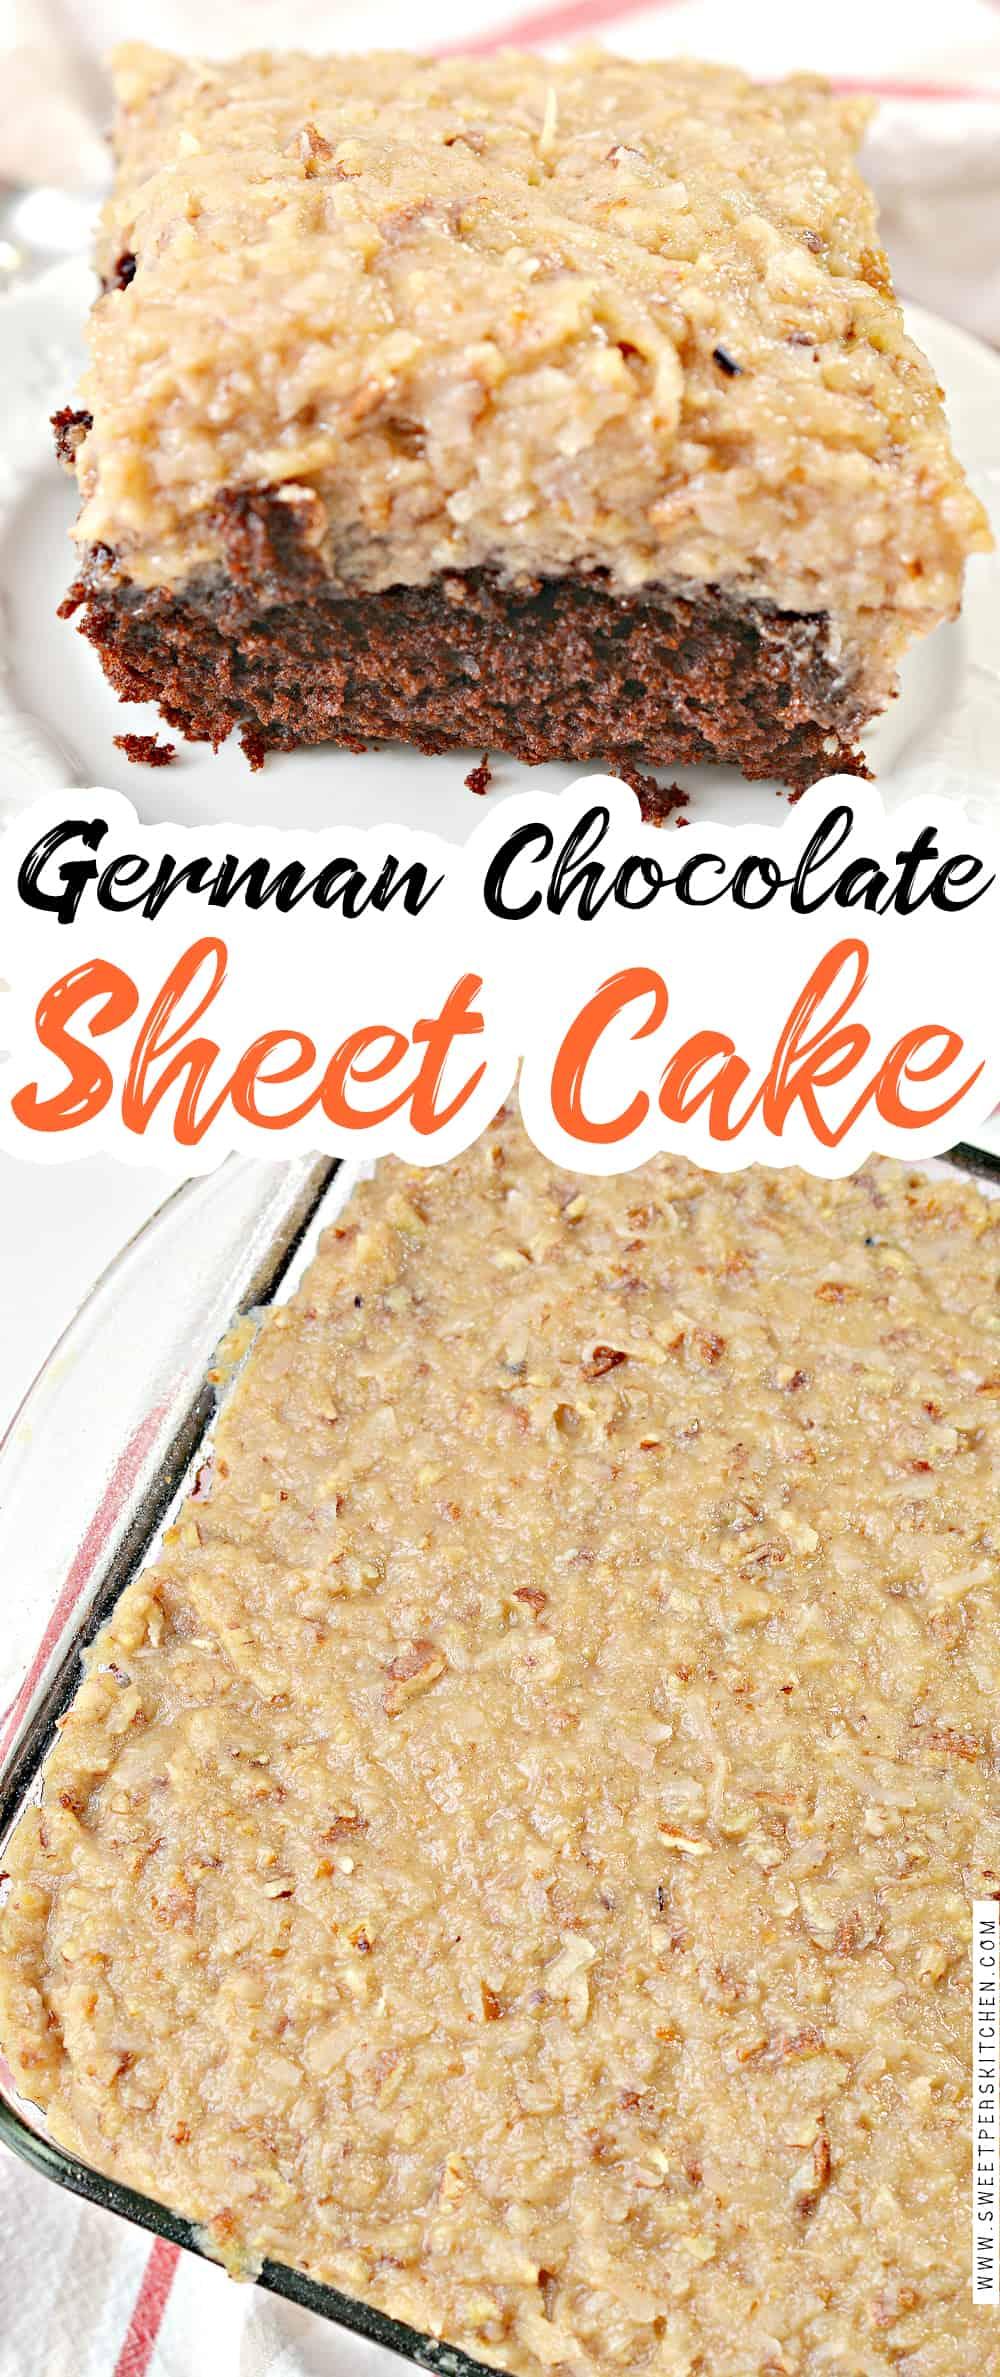 Old Fashioned German Chocolate Sheet Cake